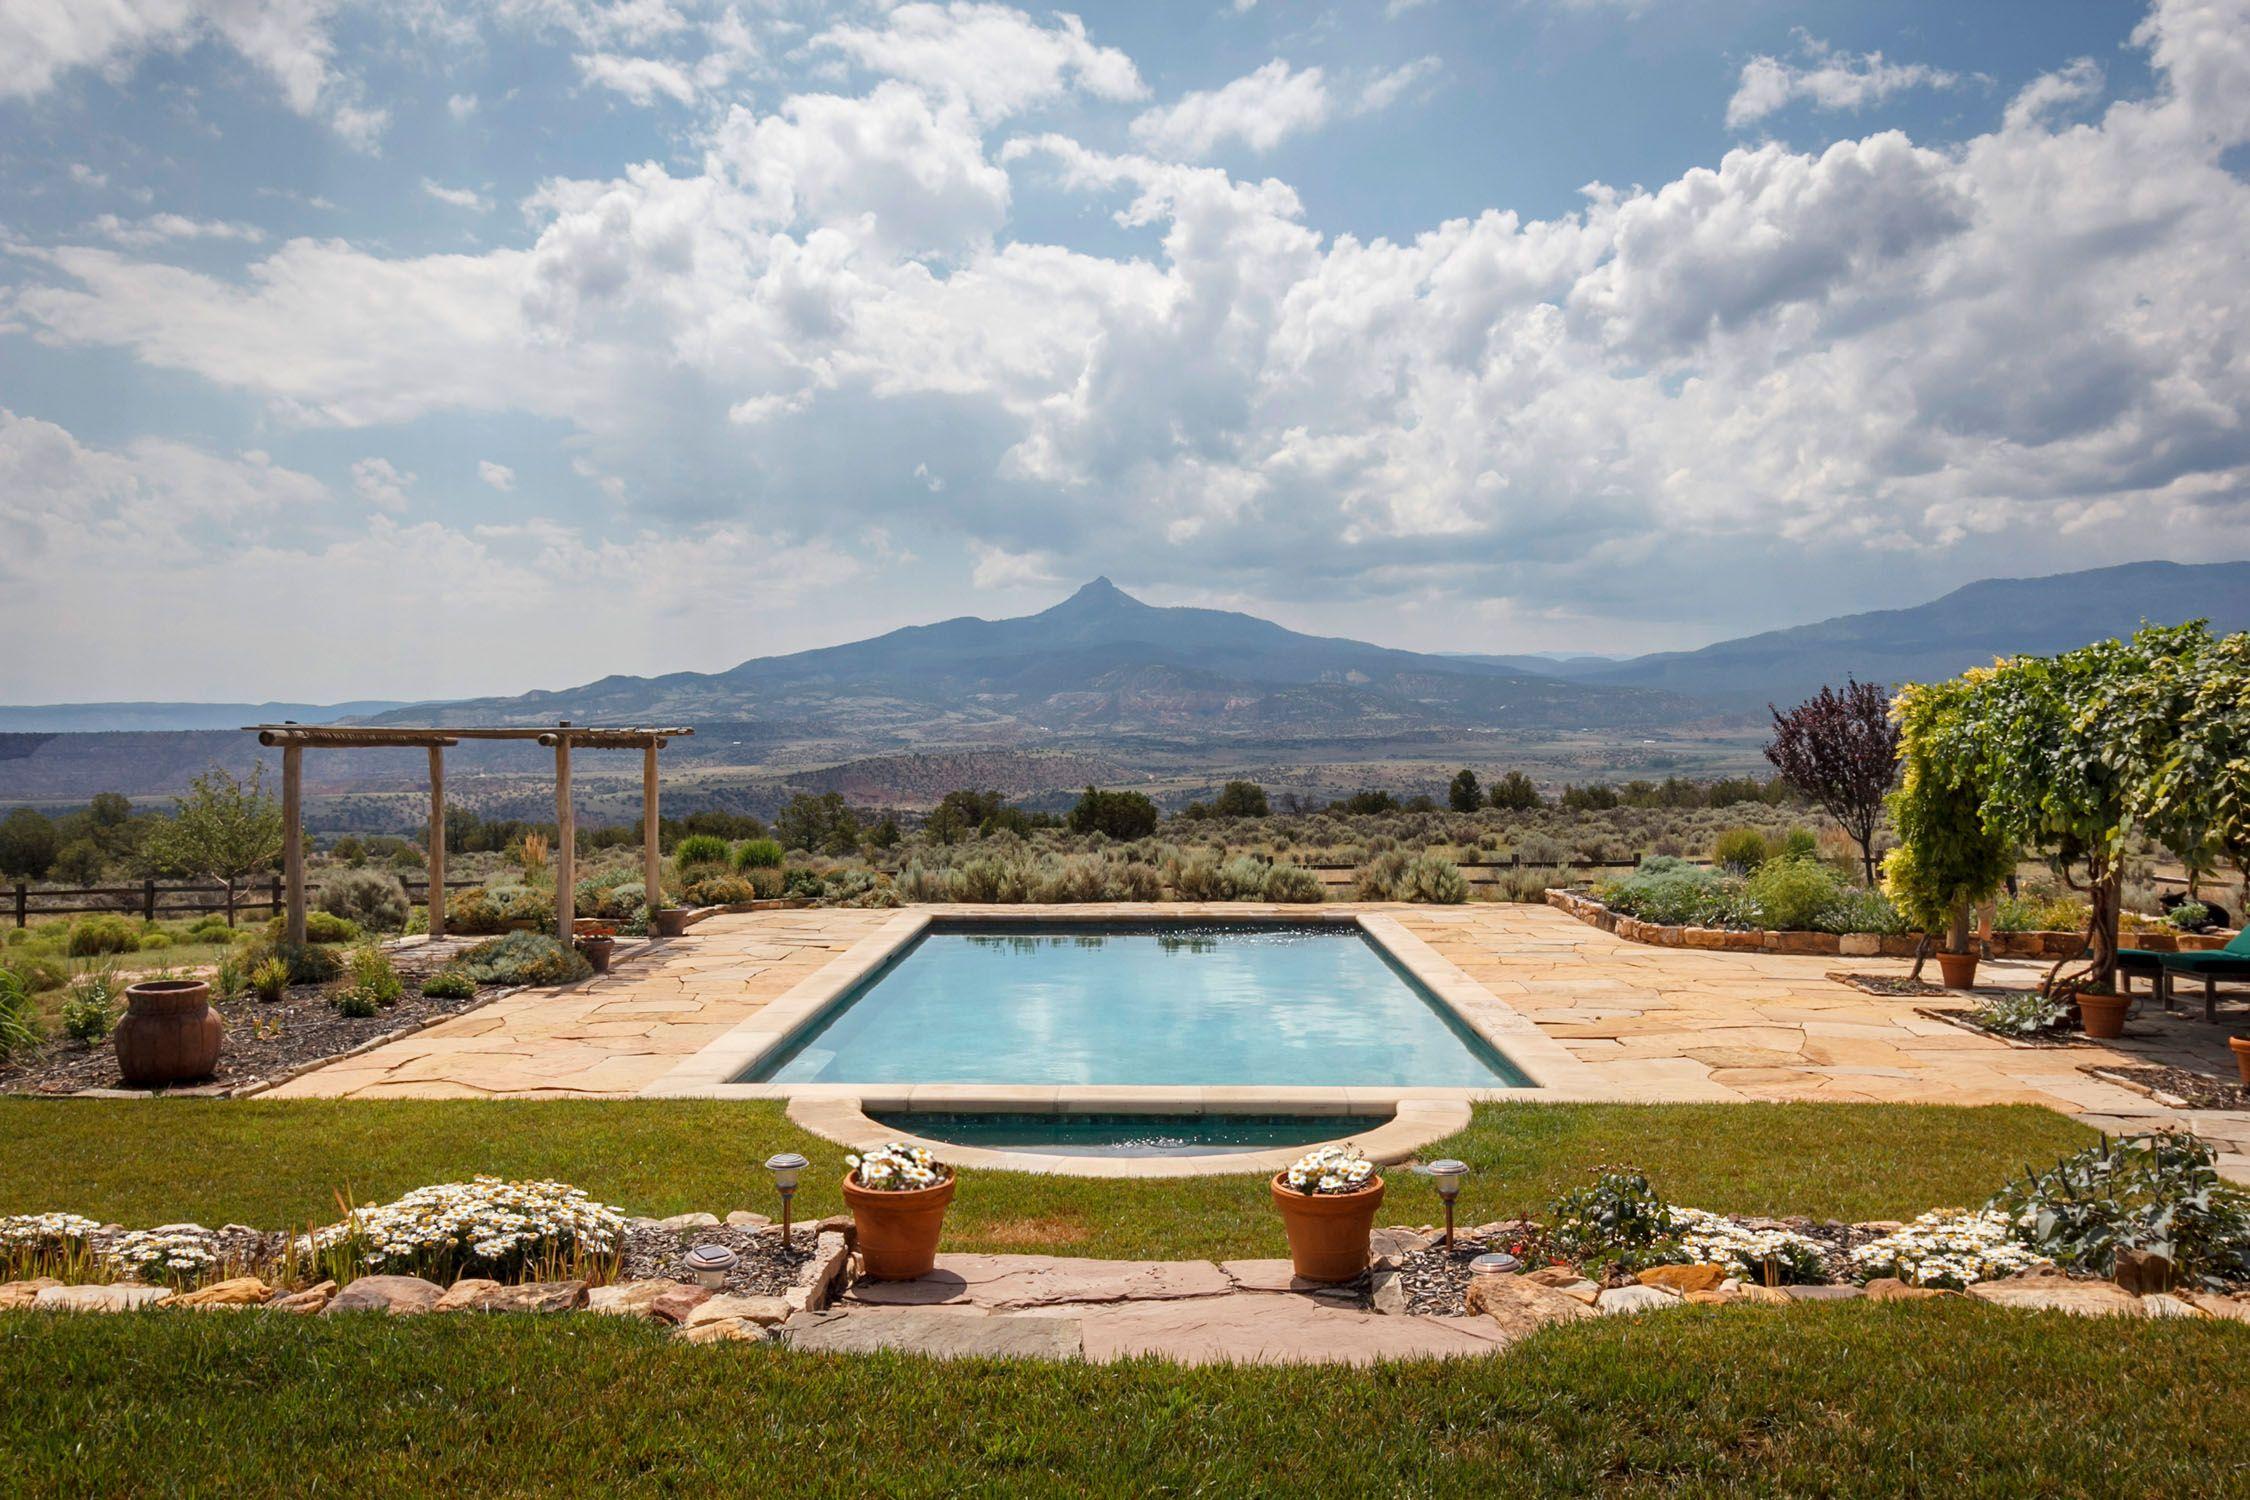 New Mexico Ranches for Sale   HomesinSantaFeNM.com   Luxury Real Estate   Luxury Brokers   Santa Fe Real Estate   Georgia O'Keeffee